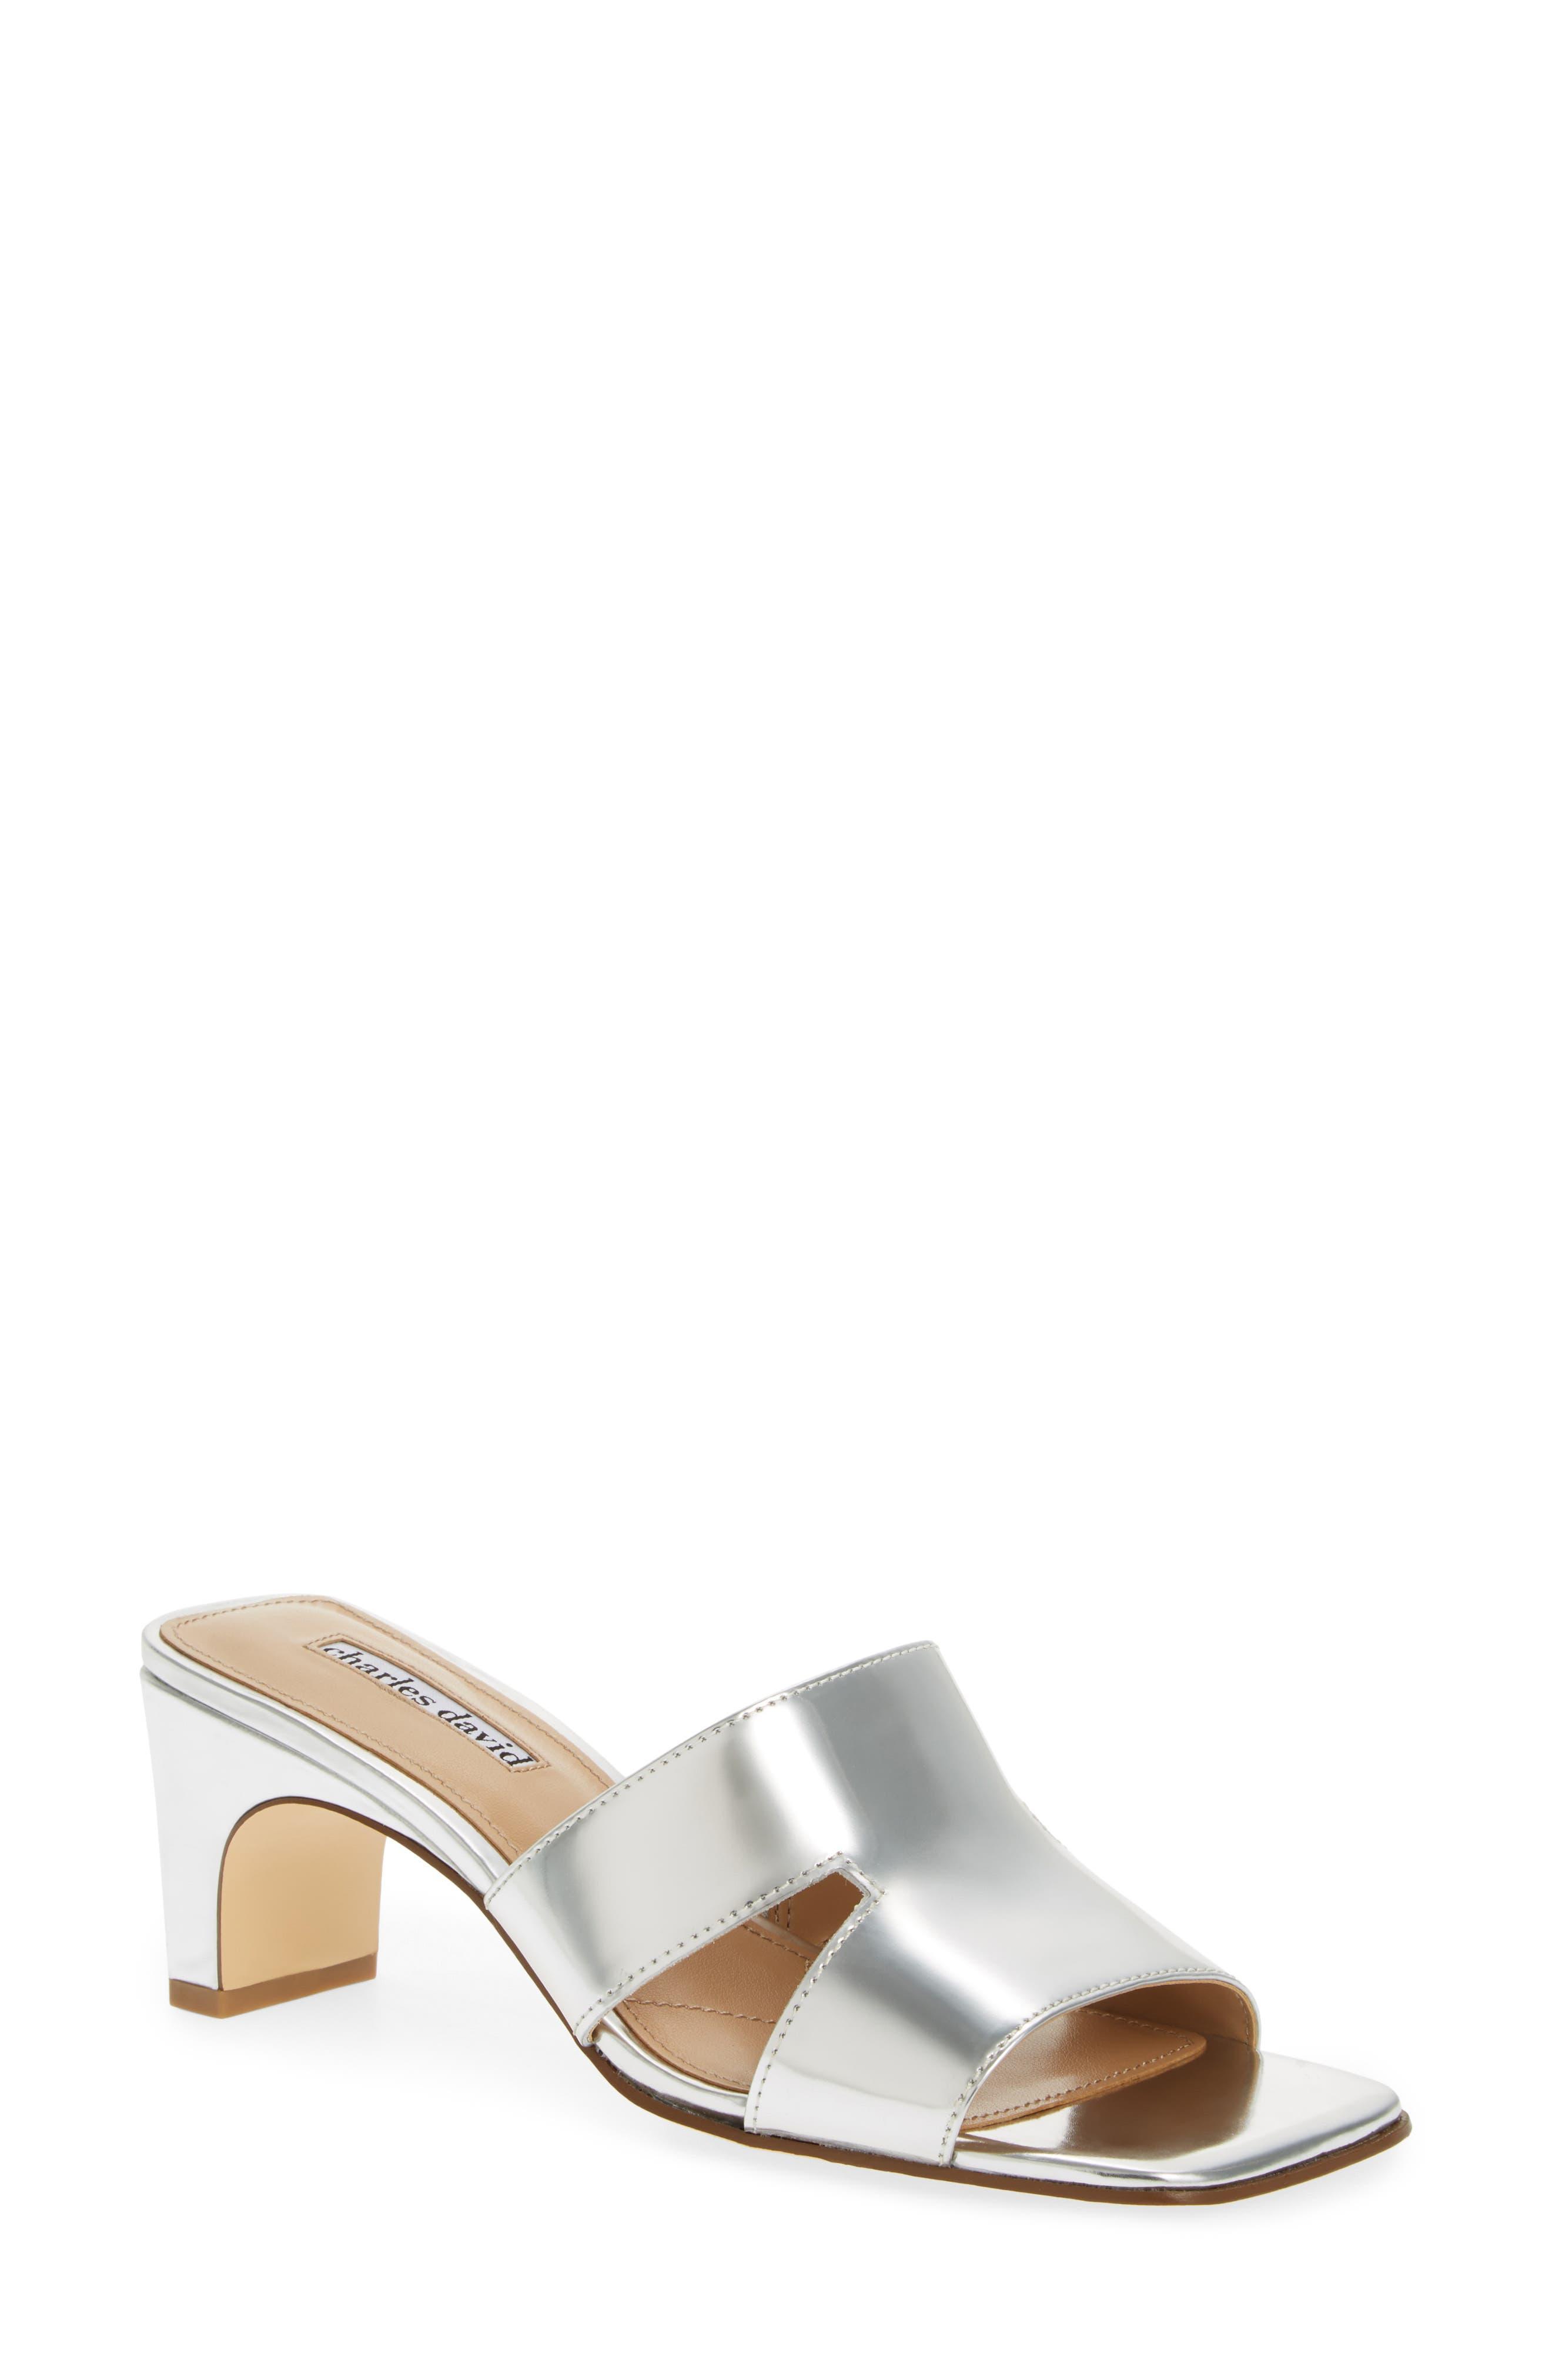 Charles David Harley Slide Sandal- Metallic